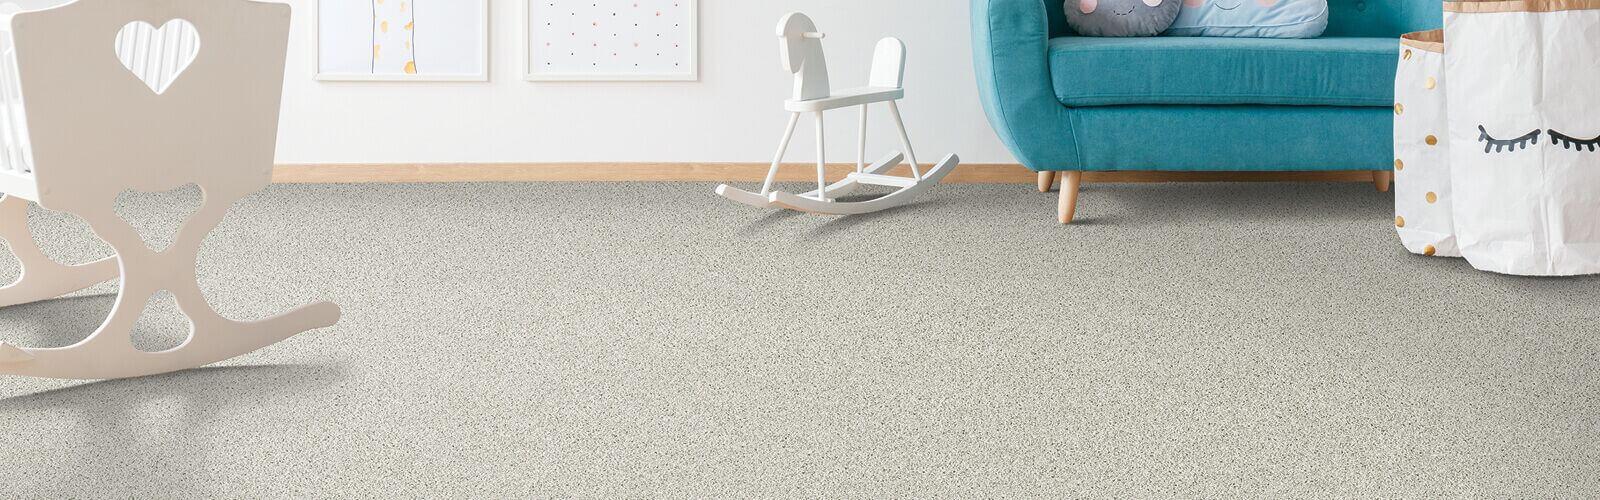 Kids room grey Carpet | BMG Flooring & Tile Center